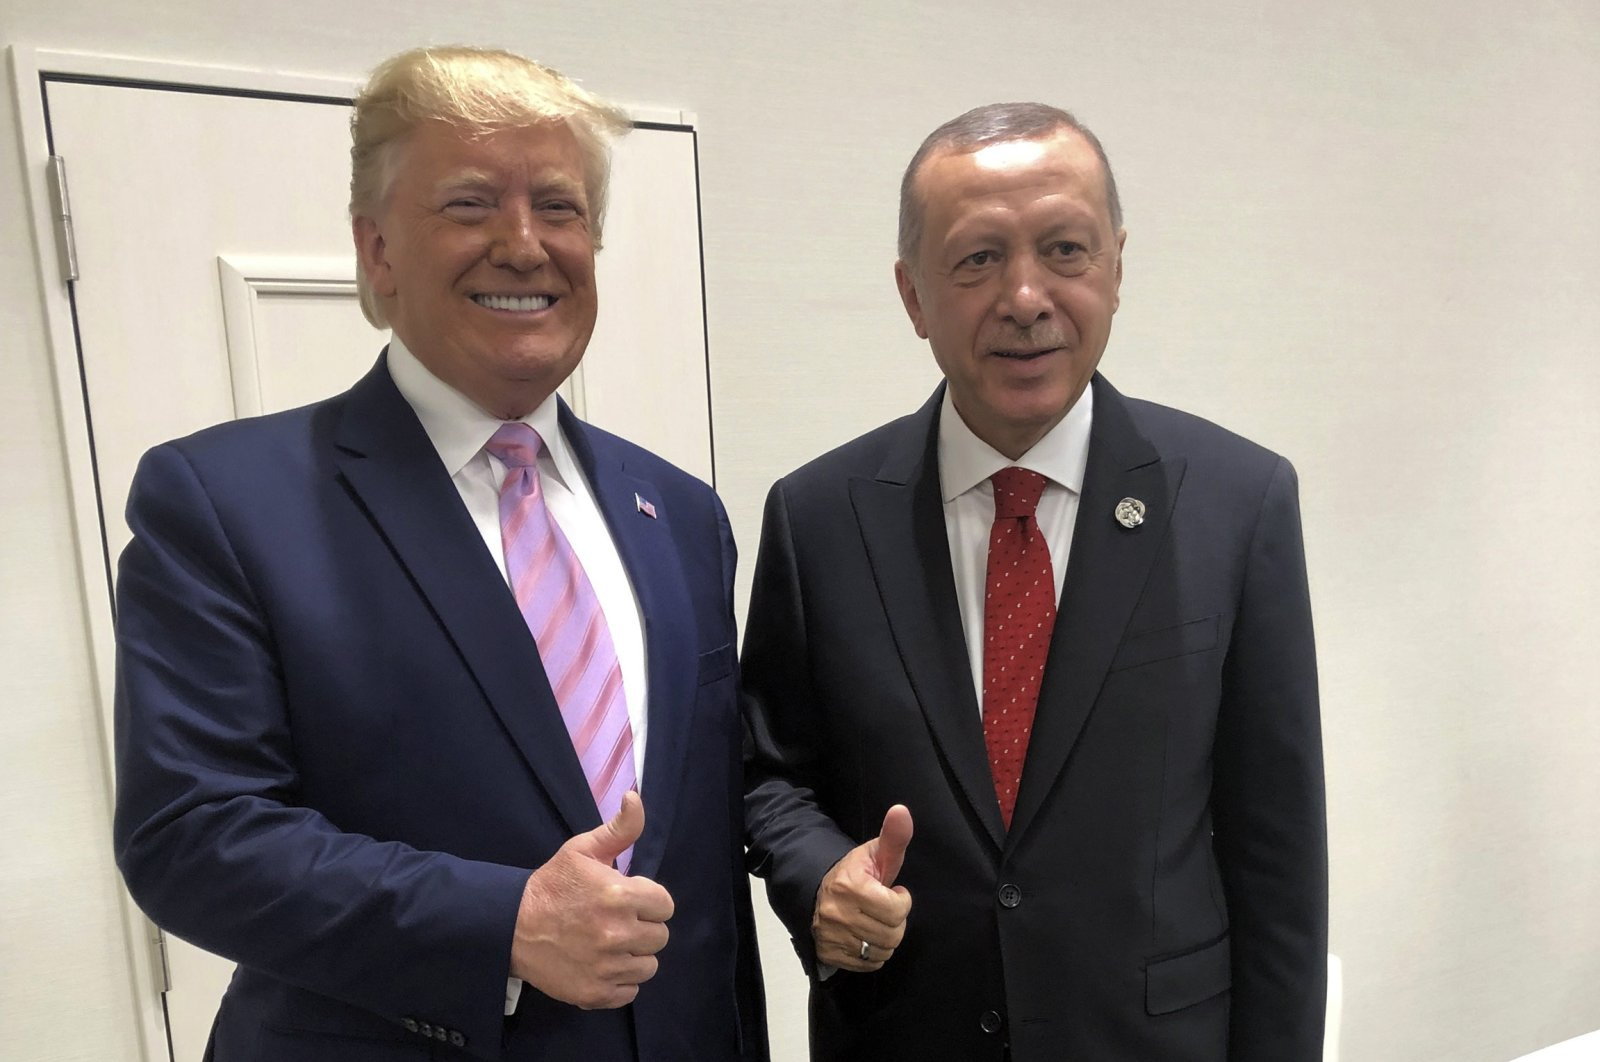 President Recep Tayyip Erdoğan, and U.S President Donald Trump gesture during the G-20 summit in Osaka, Japan, Friday, June 28, 2019. (AP Photo)